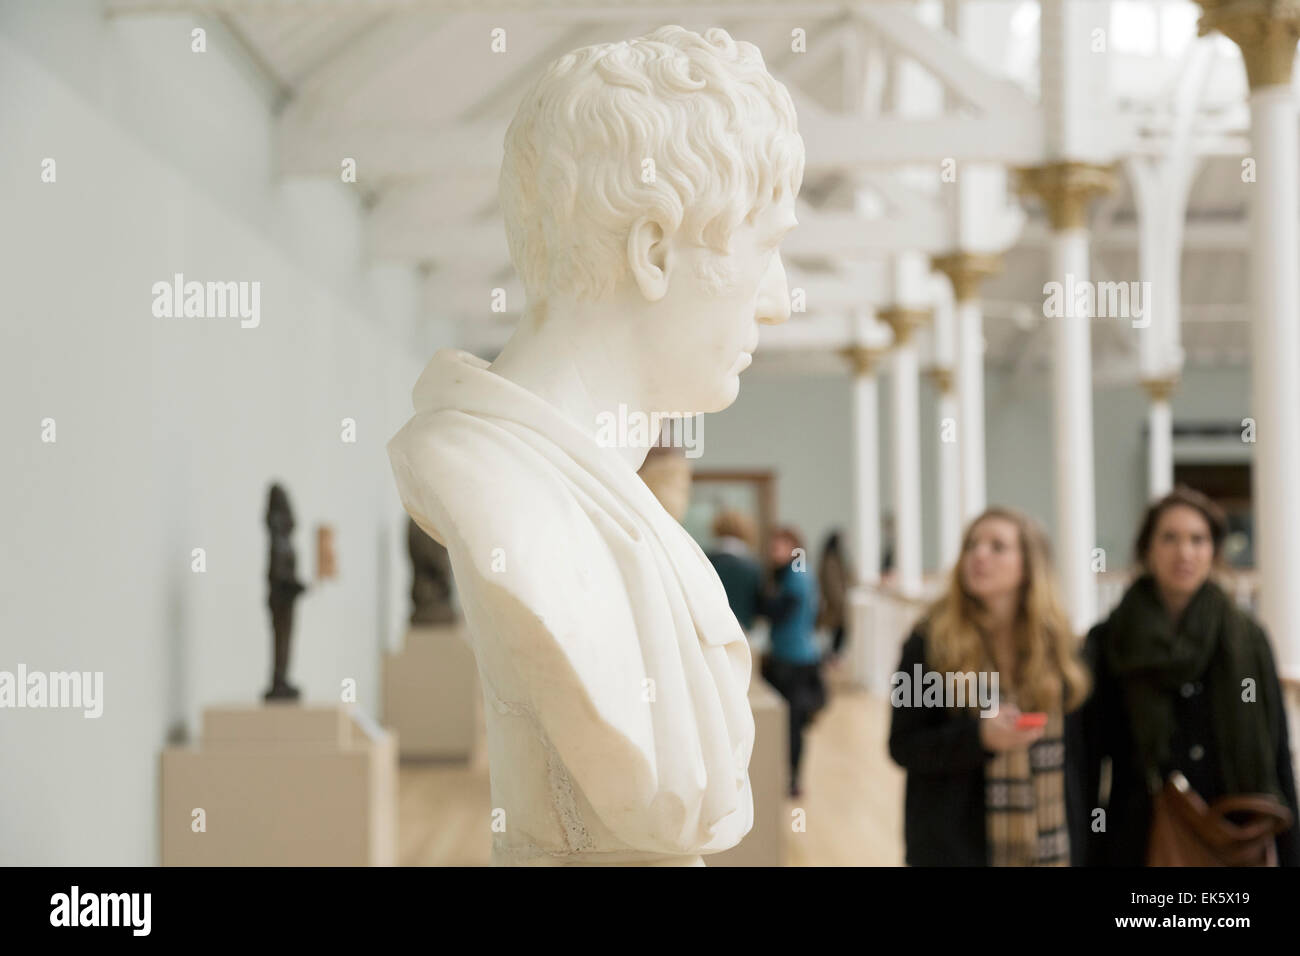 National Museum Of Scotland. Busts On Walkway Of Second Floor. - Stock Image